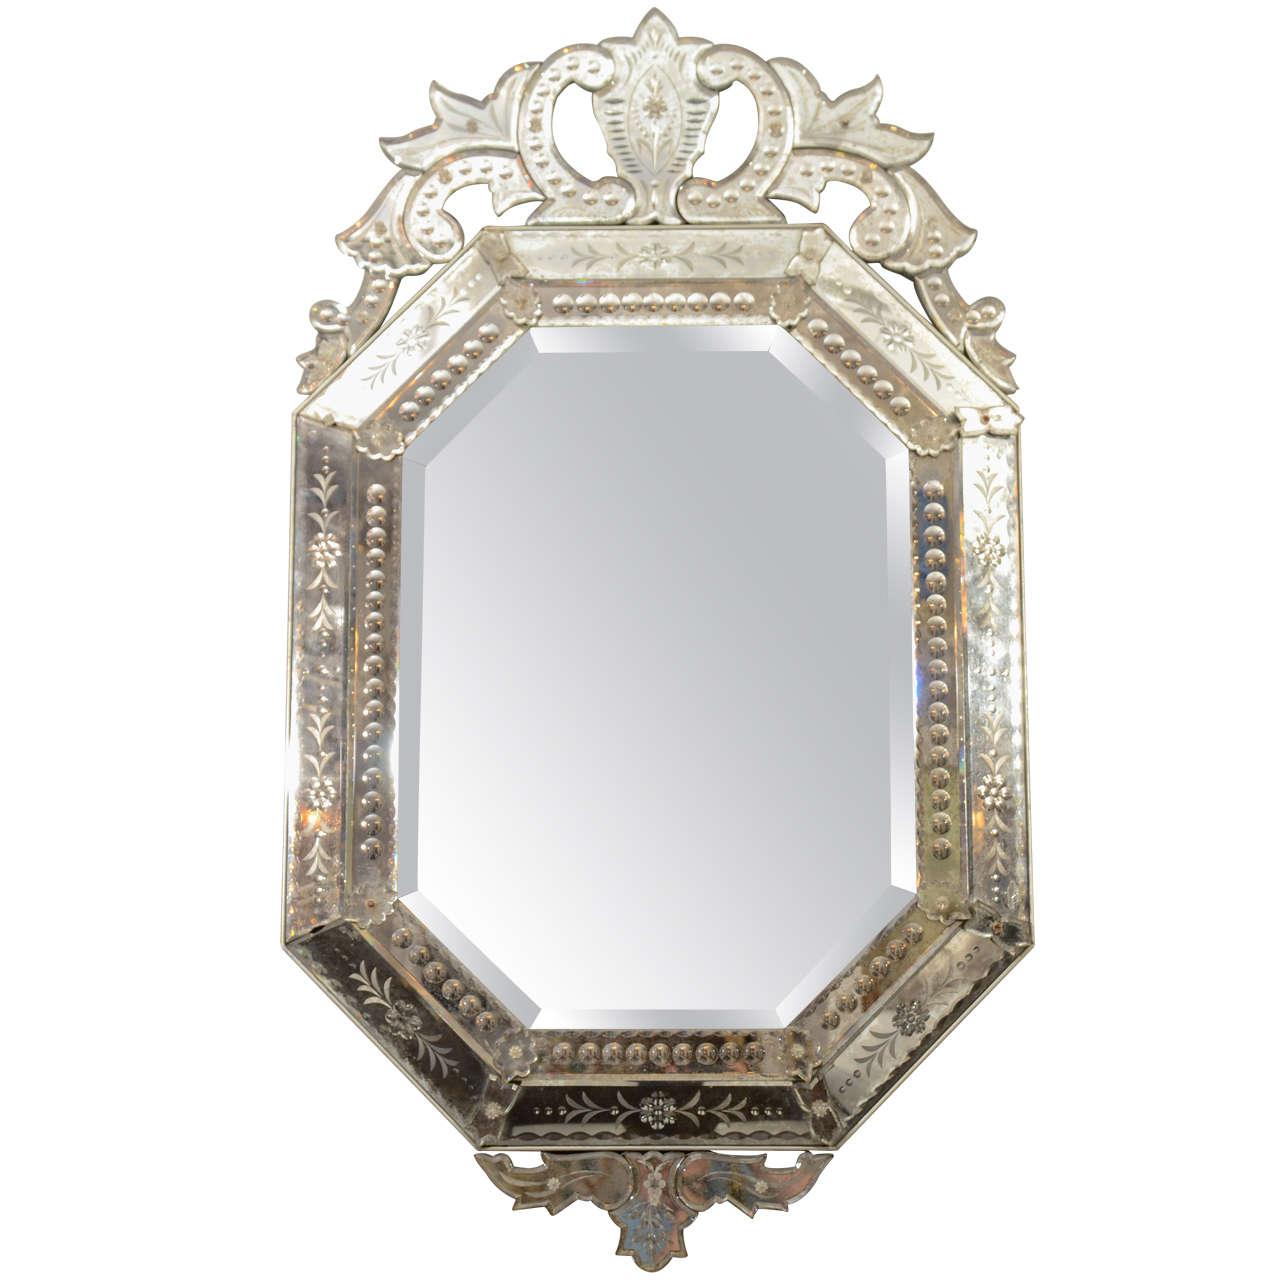 Vintage venetian mirror at 1stdibs for Vintage mirror